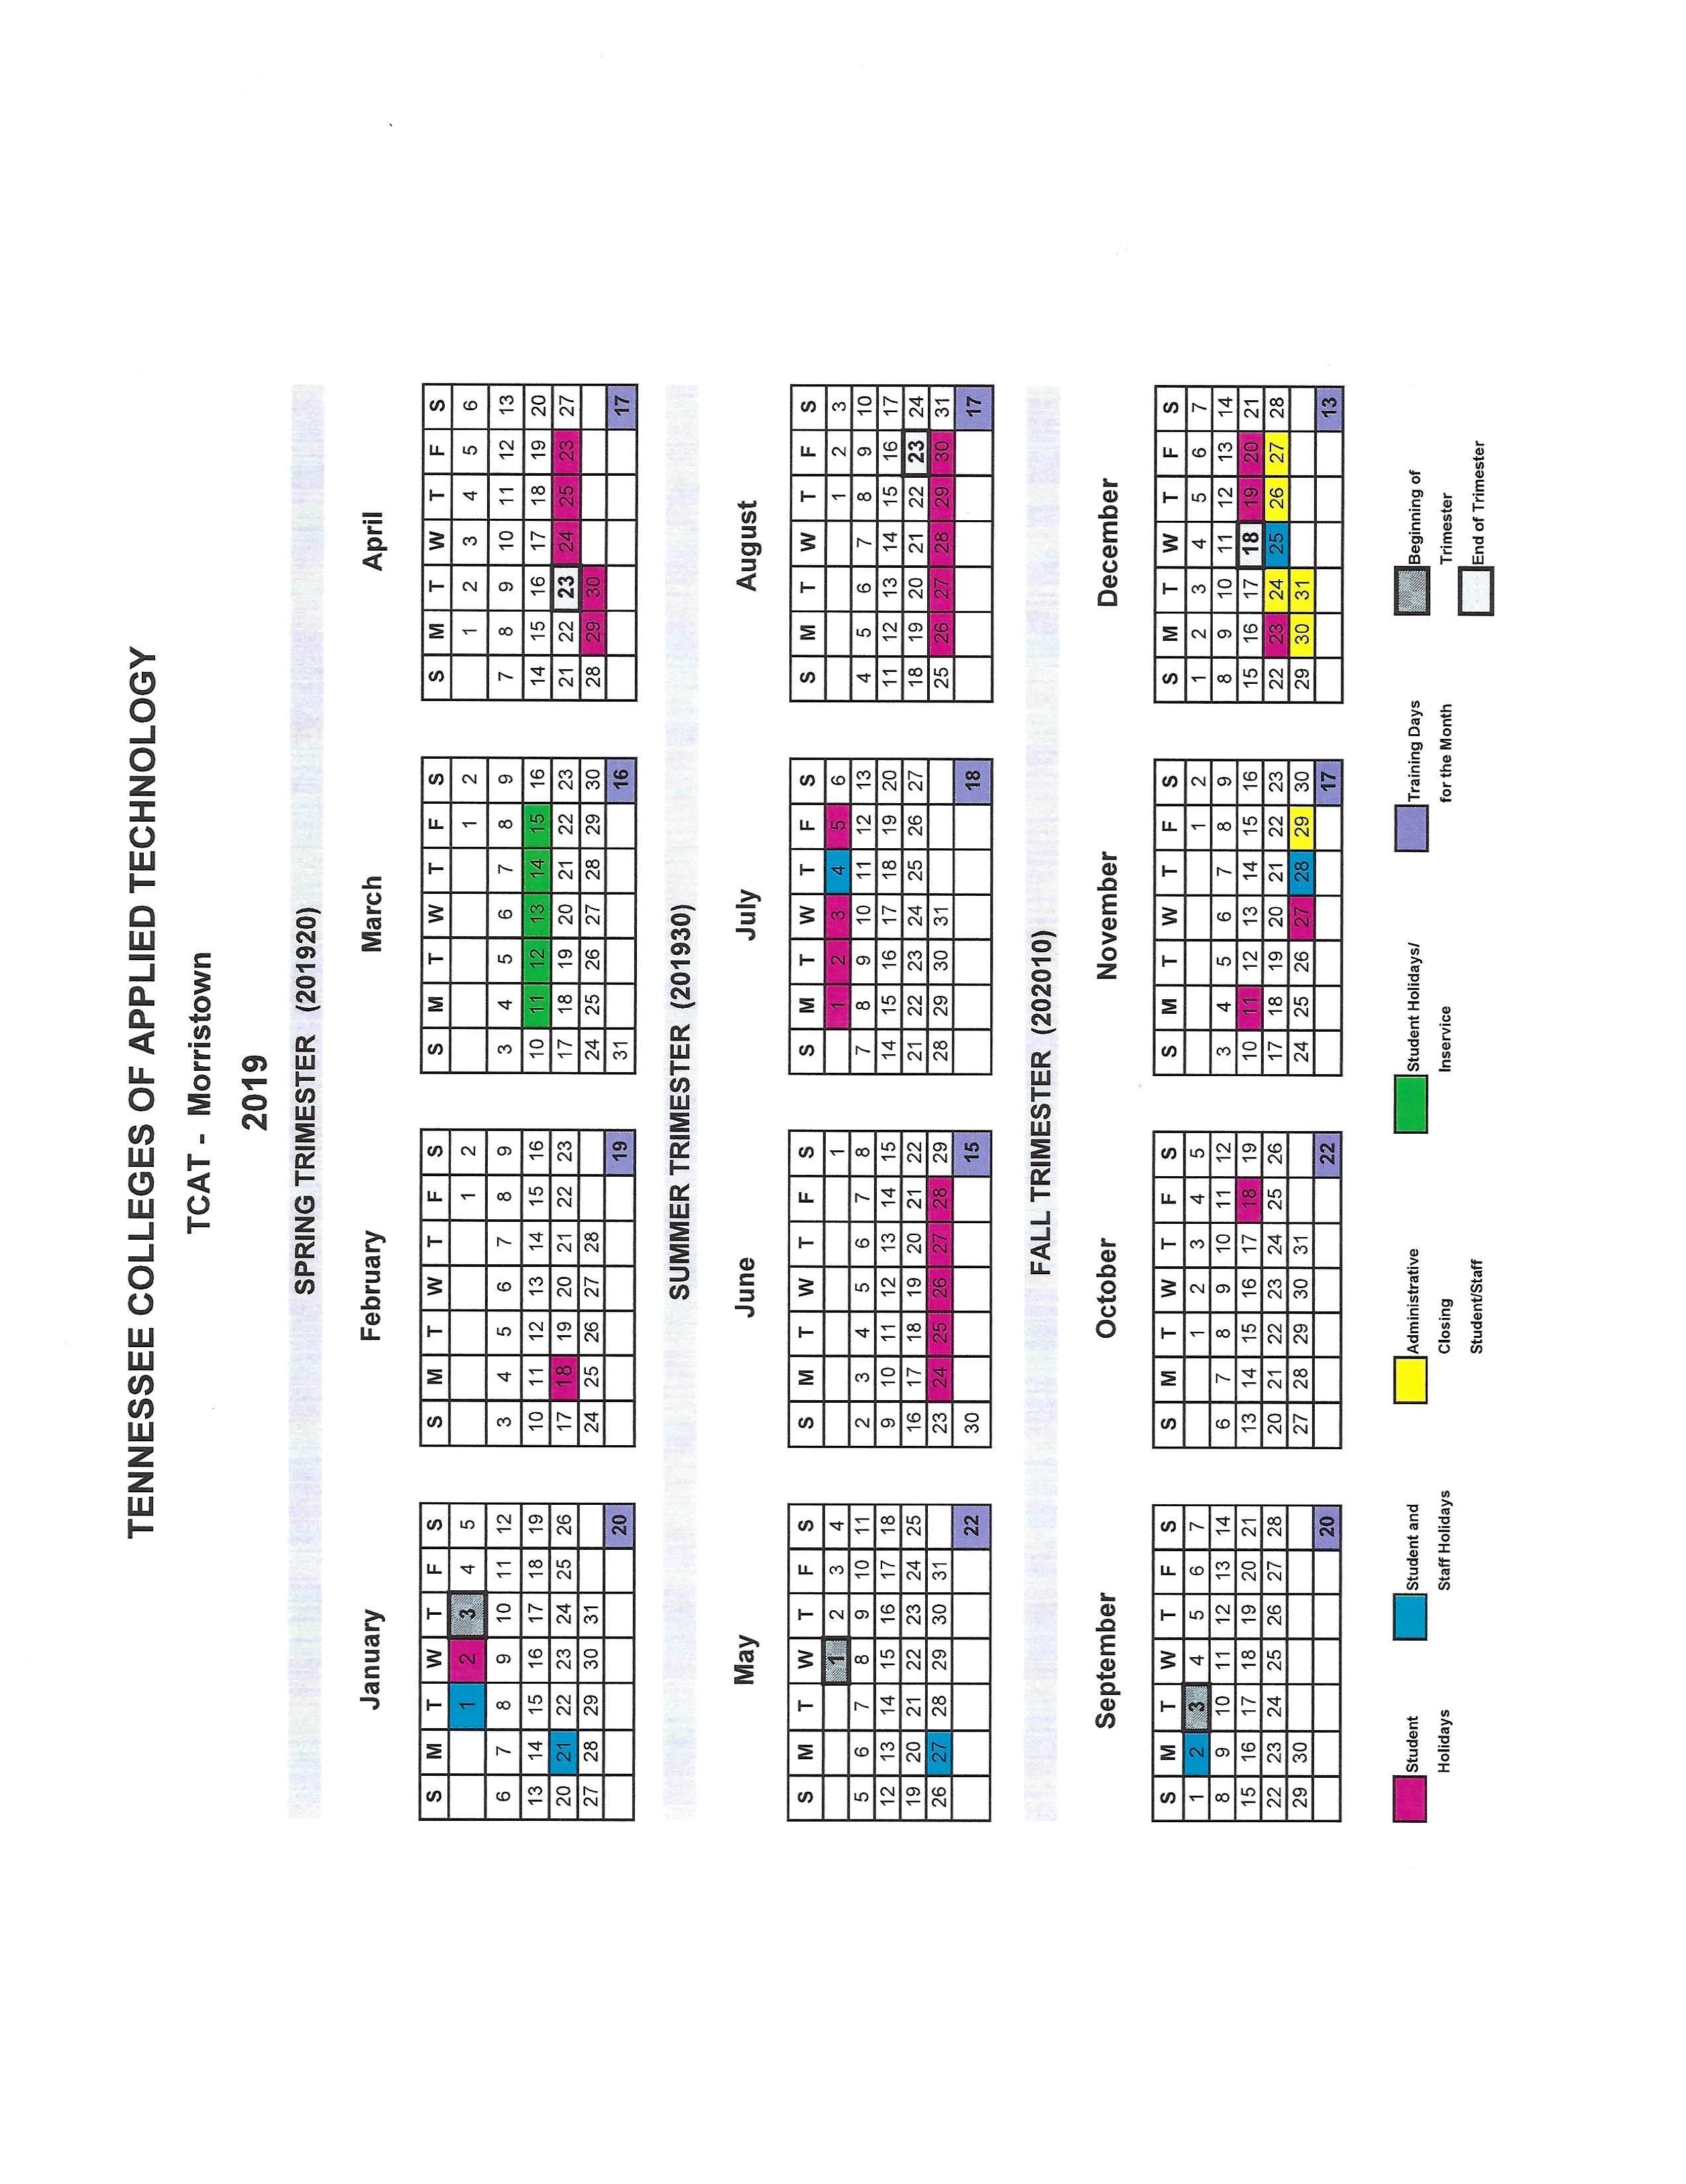 2019 academic calendar